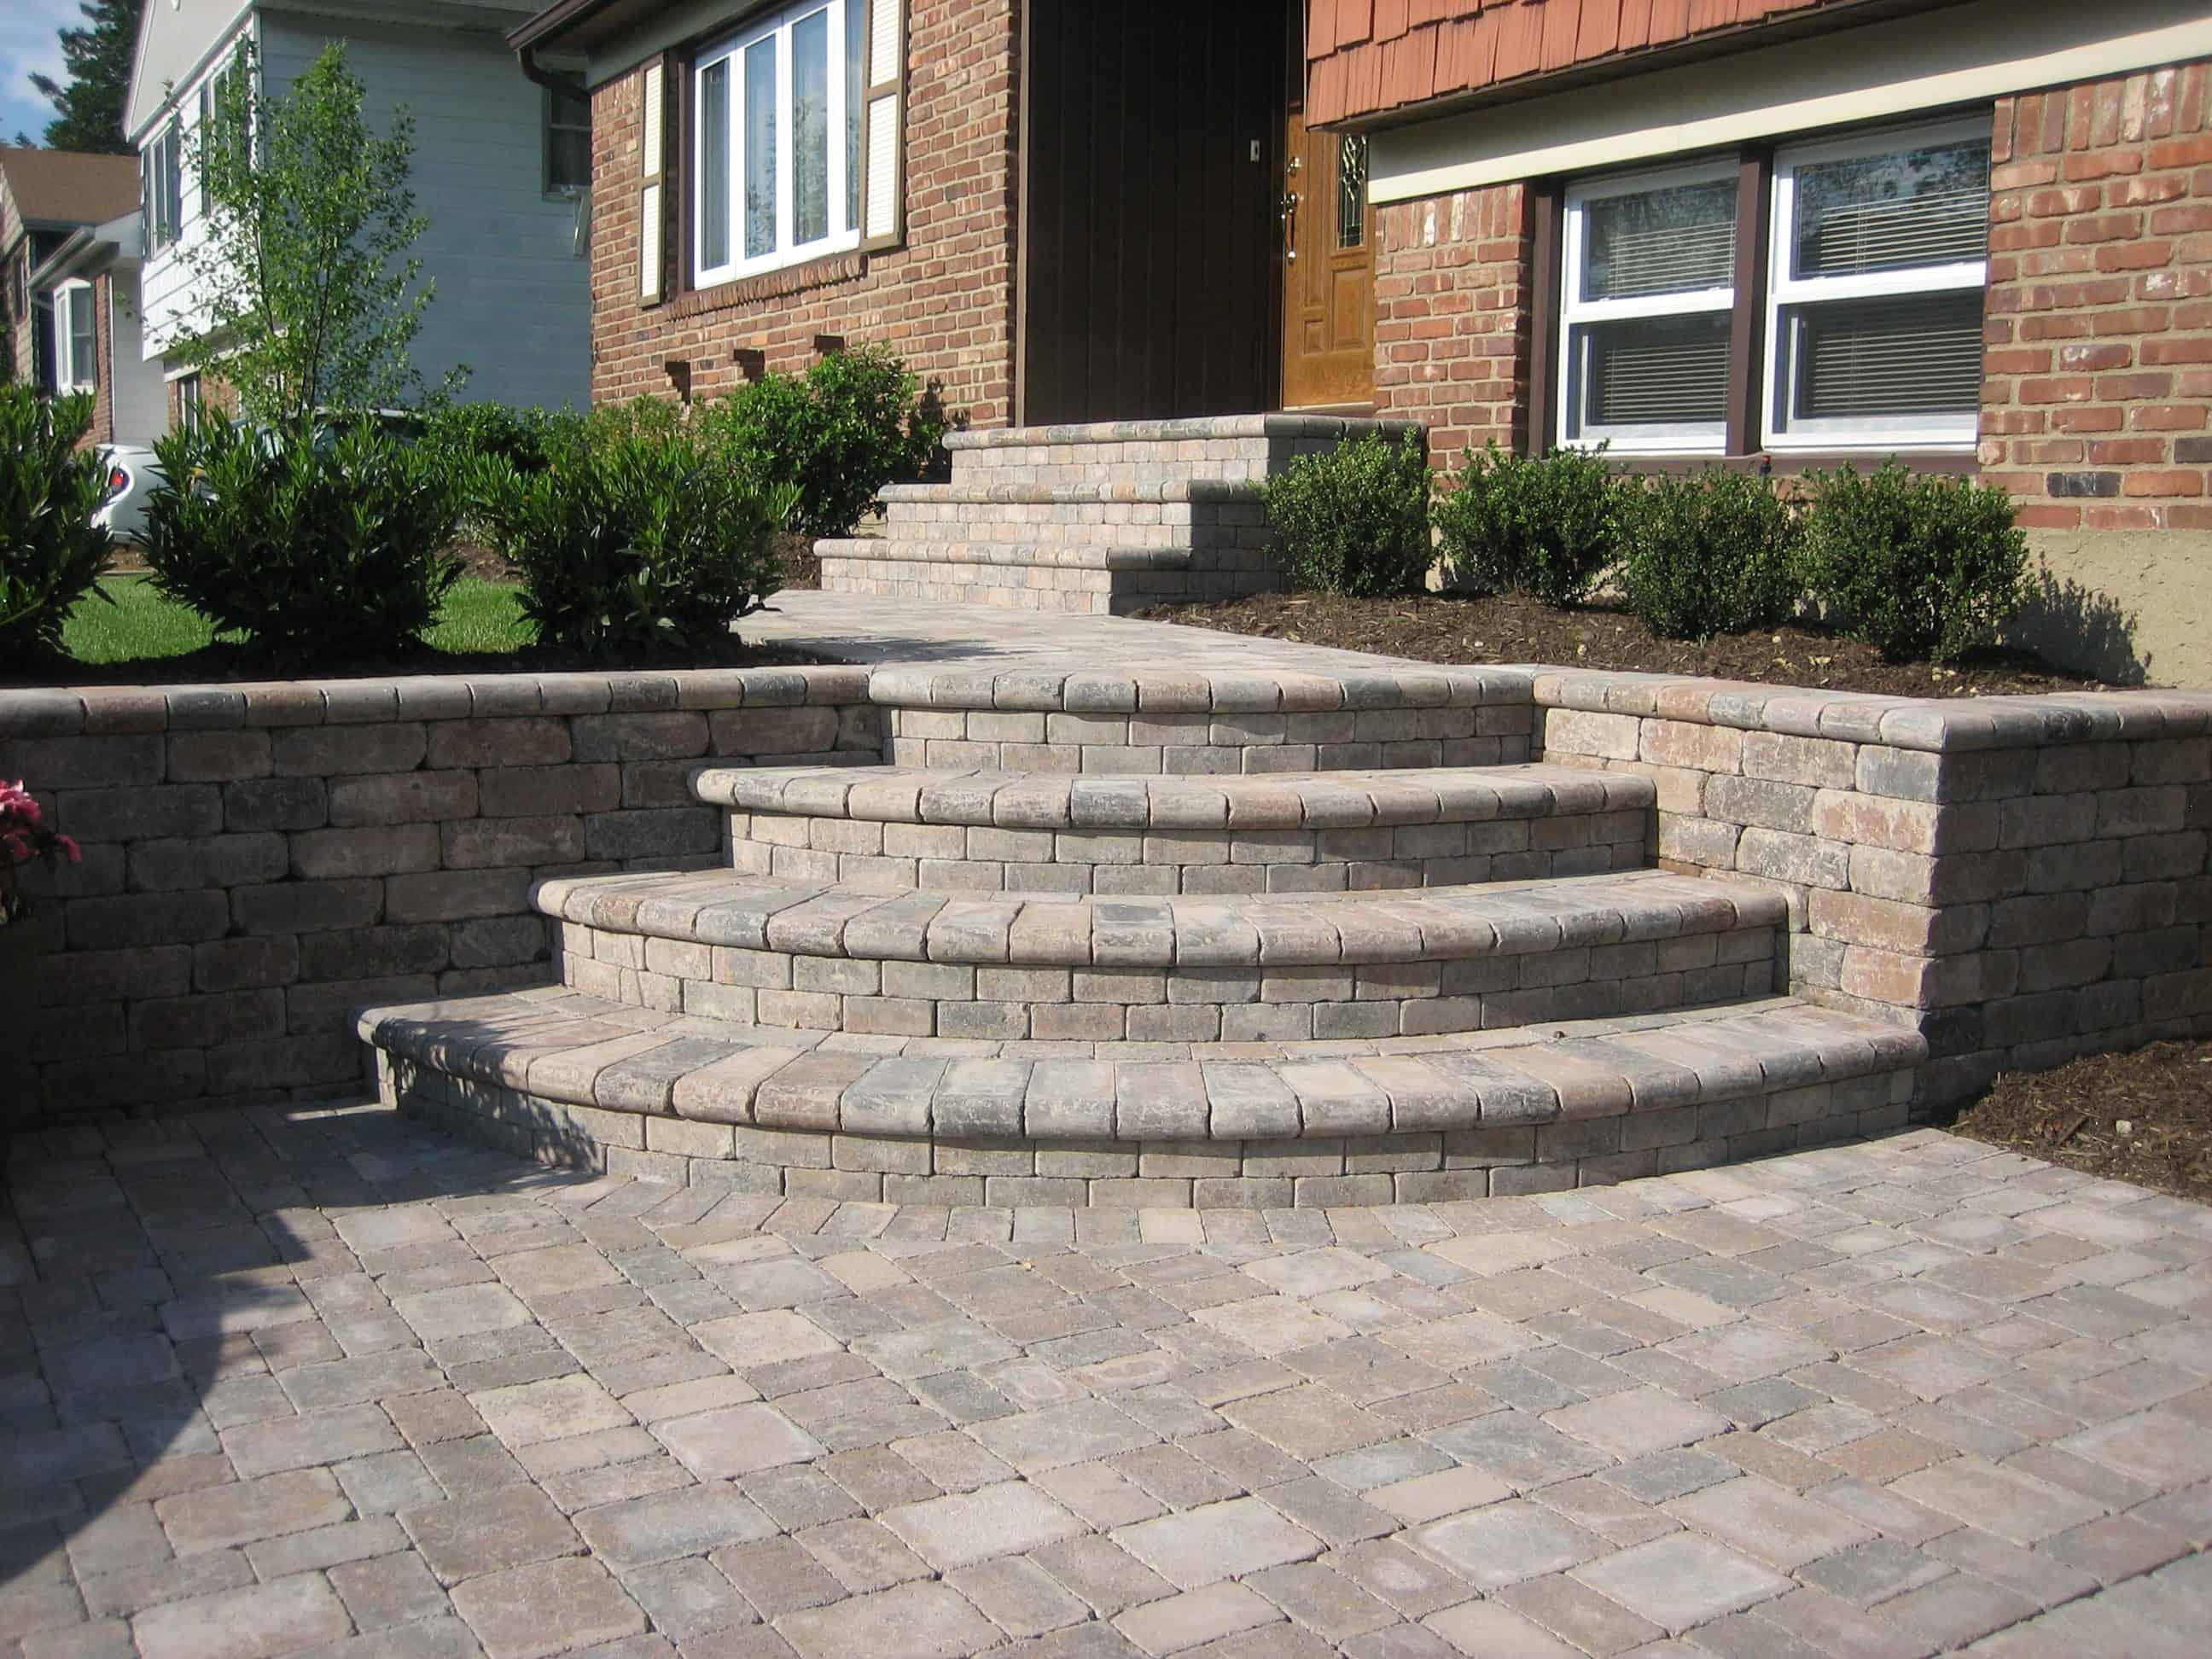 Paver Walkway - Unilock Tumbled Brussels Block Walkway and Steps - Terra Cota - Random Pattern - Plainview, Long Island NY